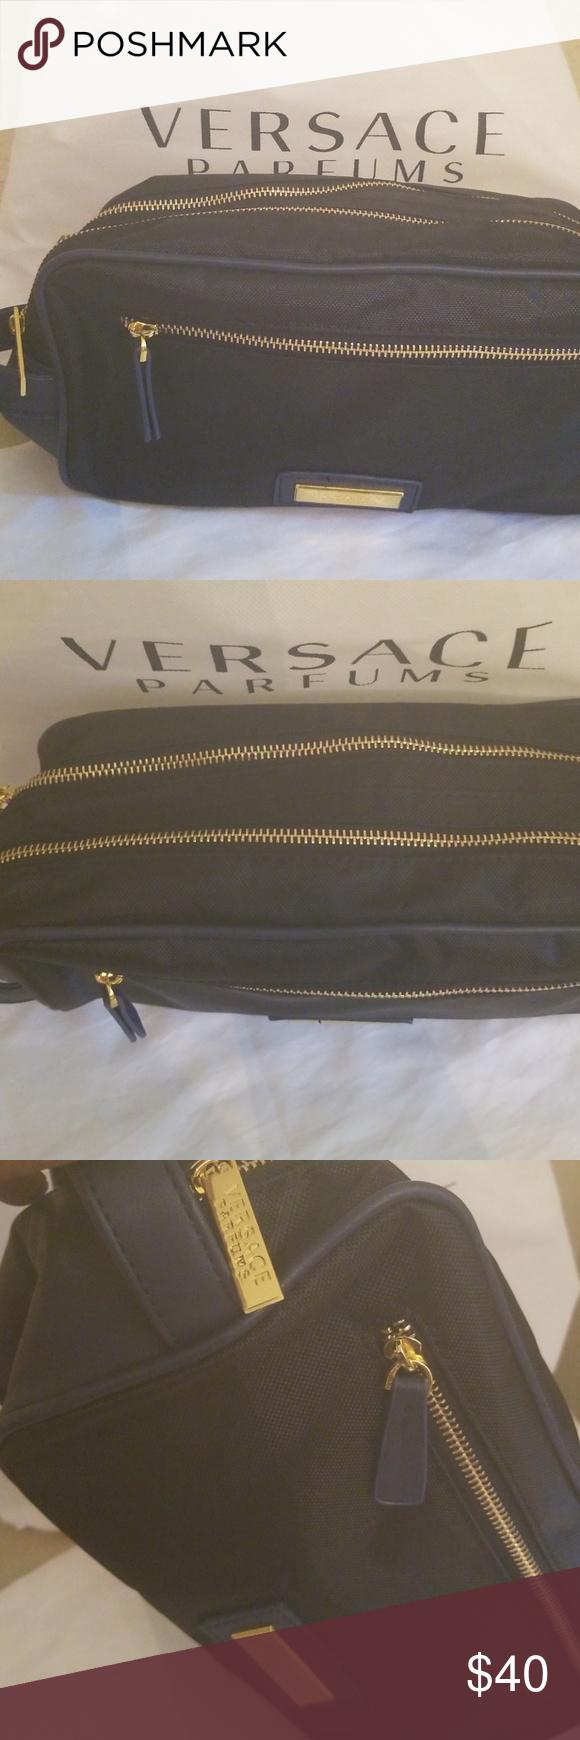 BagNavy Gold Versace Perfumesamp; Makeup And BlueBlack QdhxsCtr